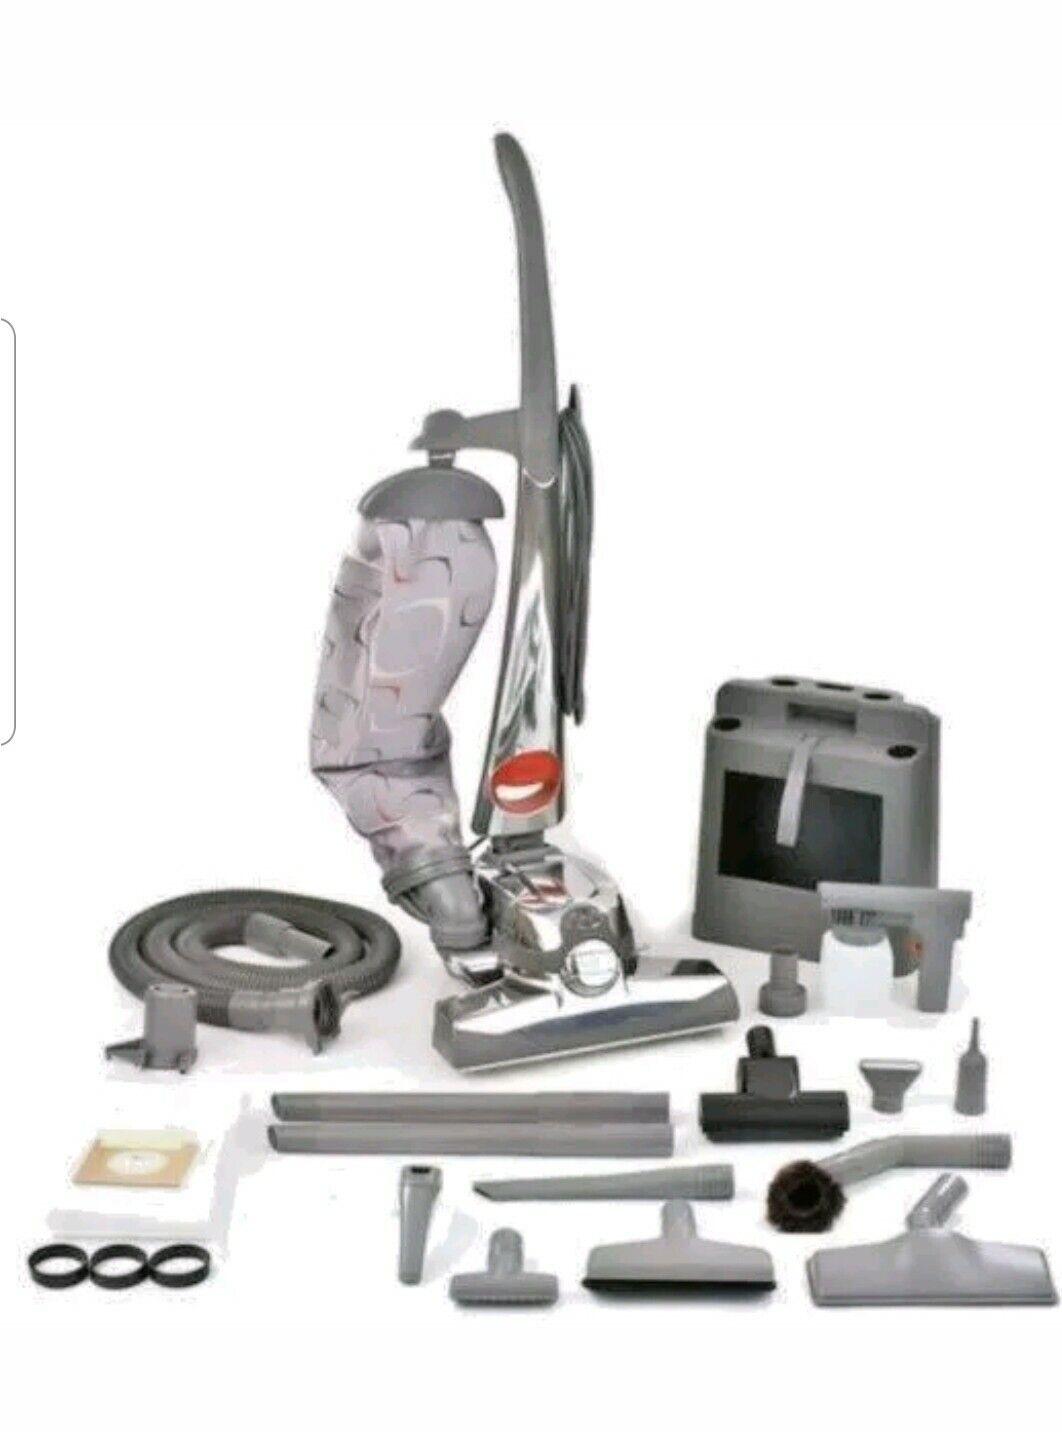 Kirby Sentria Upright Vacuum  & Shampoo System